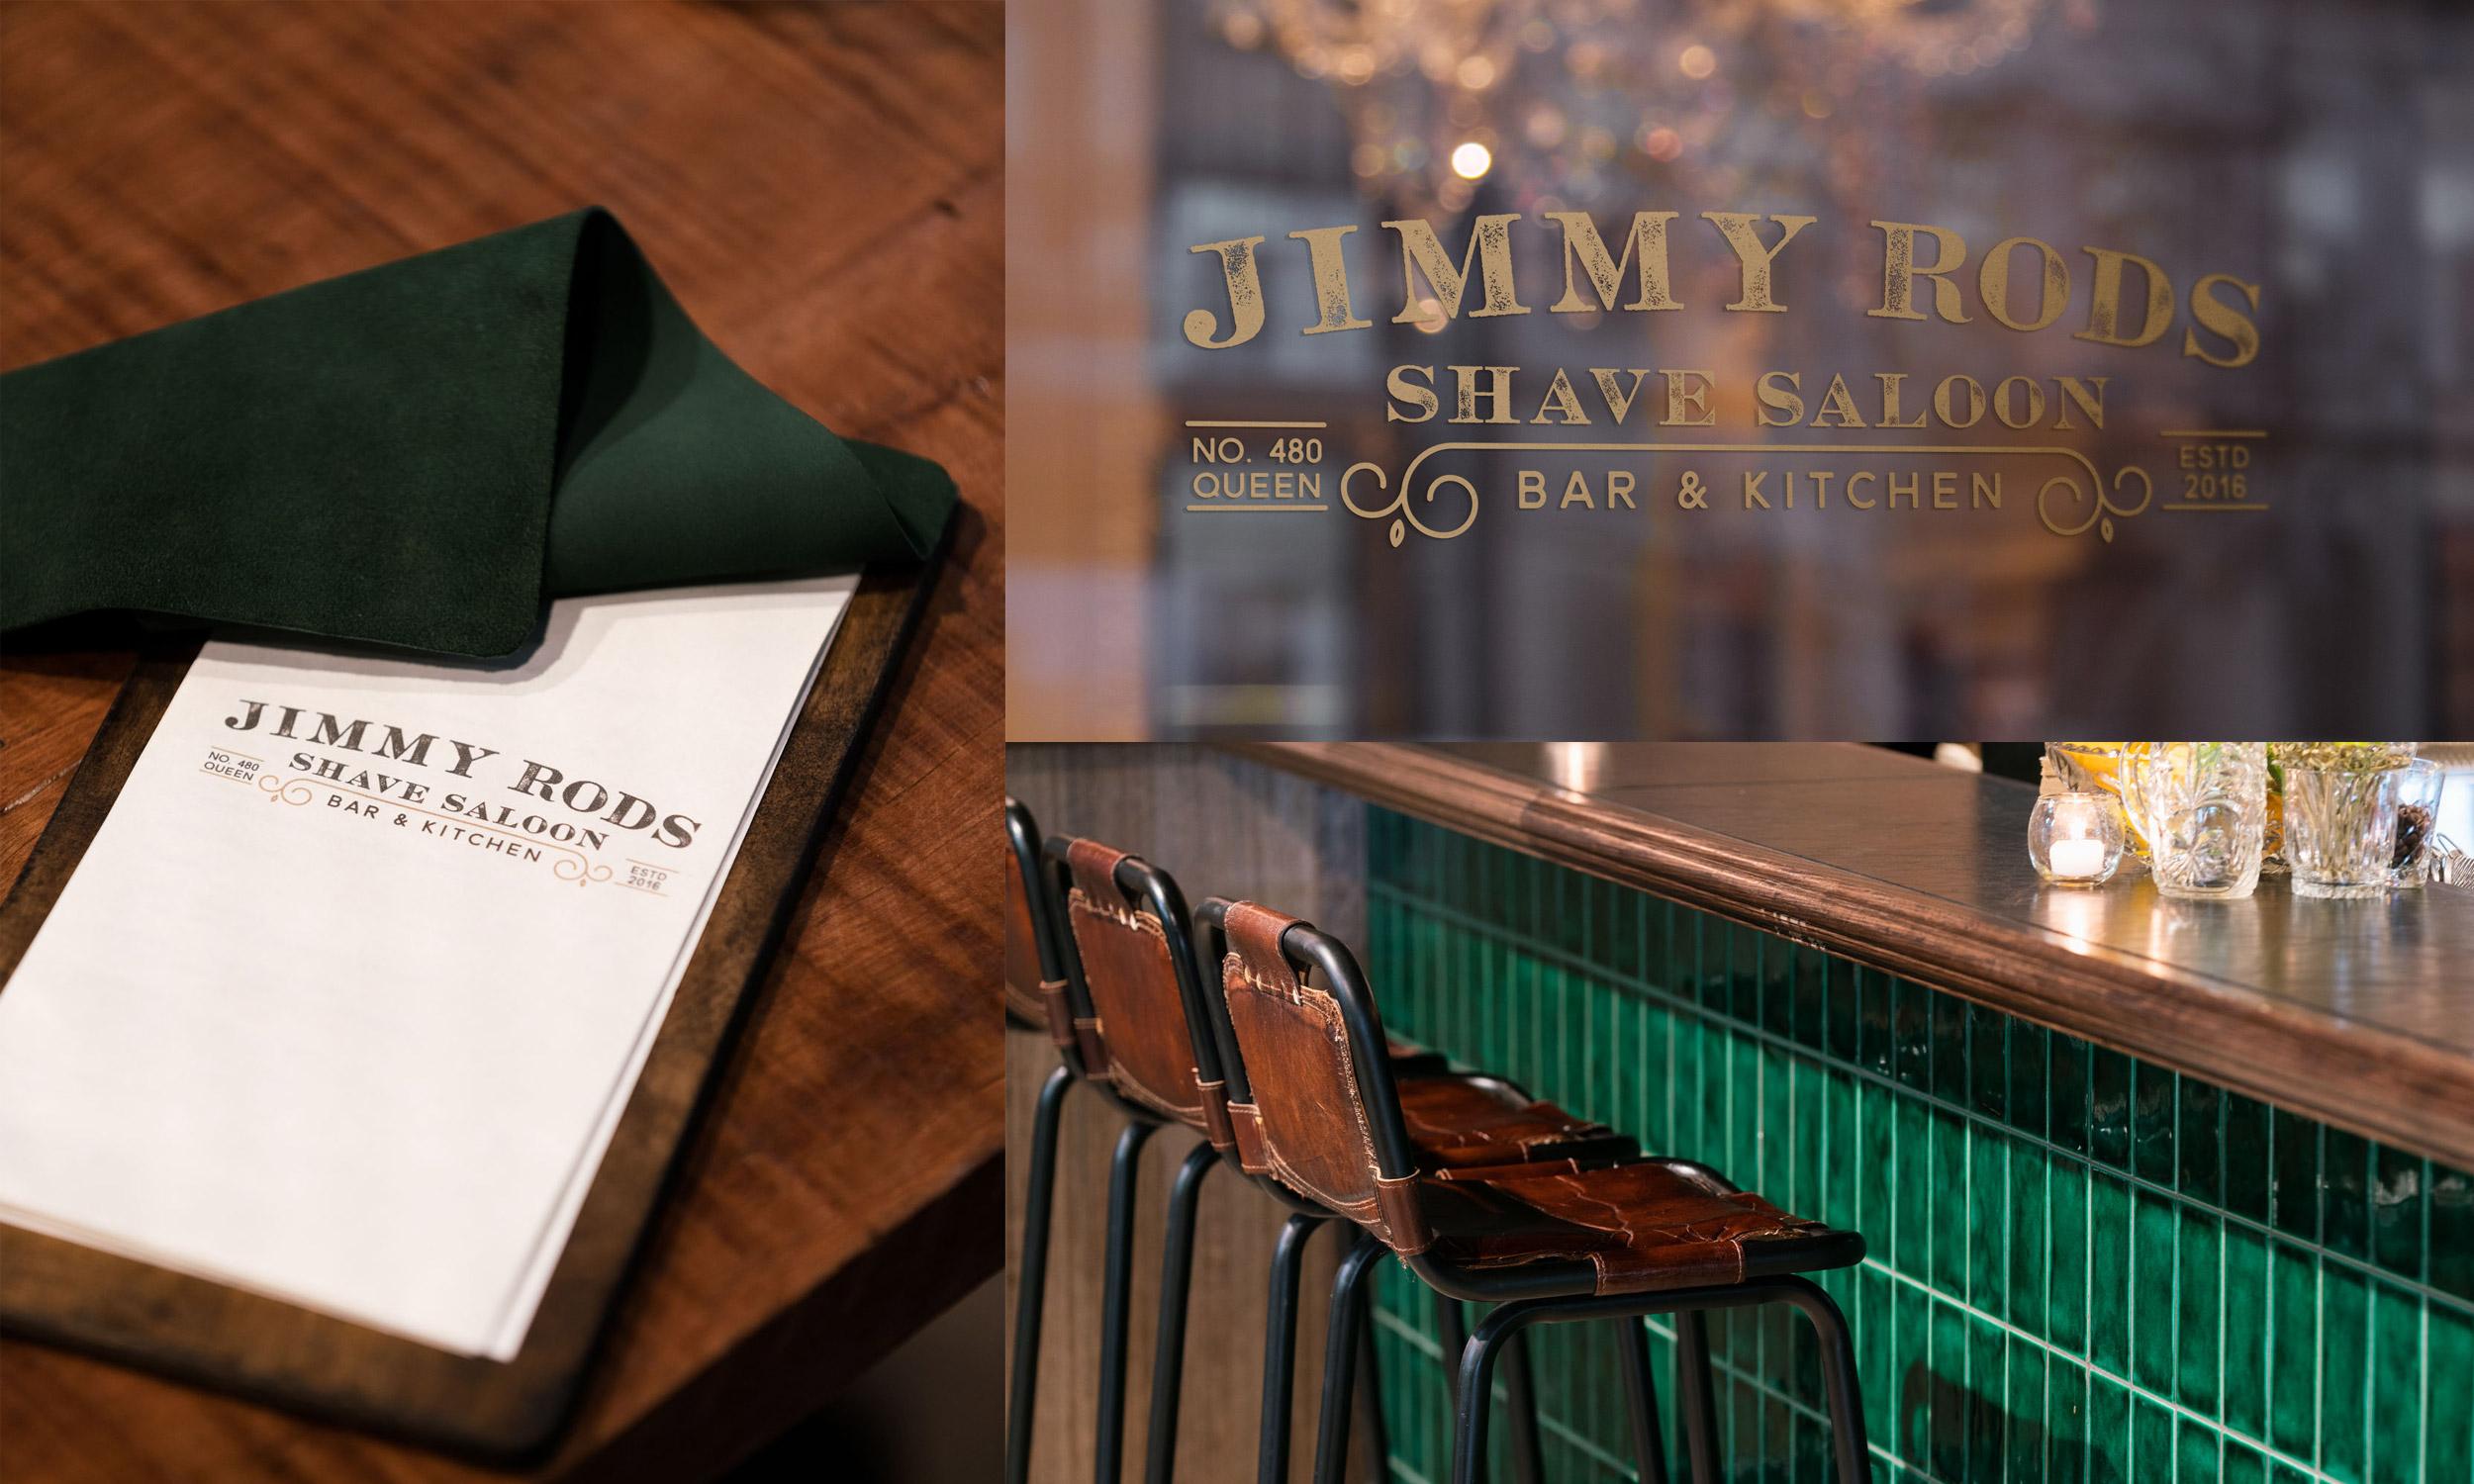 Jimmy Rods Shave Saloon menu   Window shop sticker